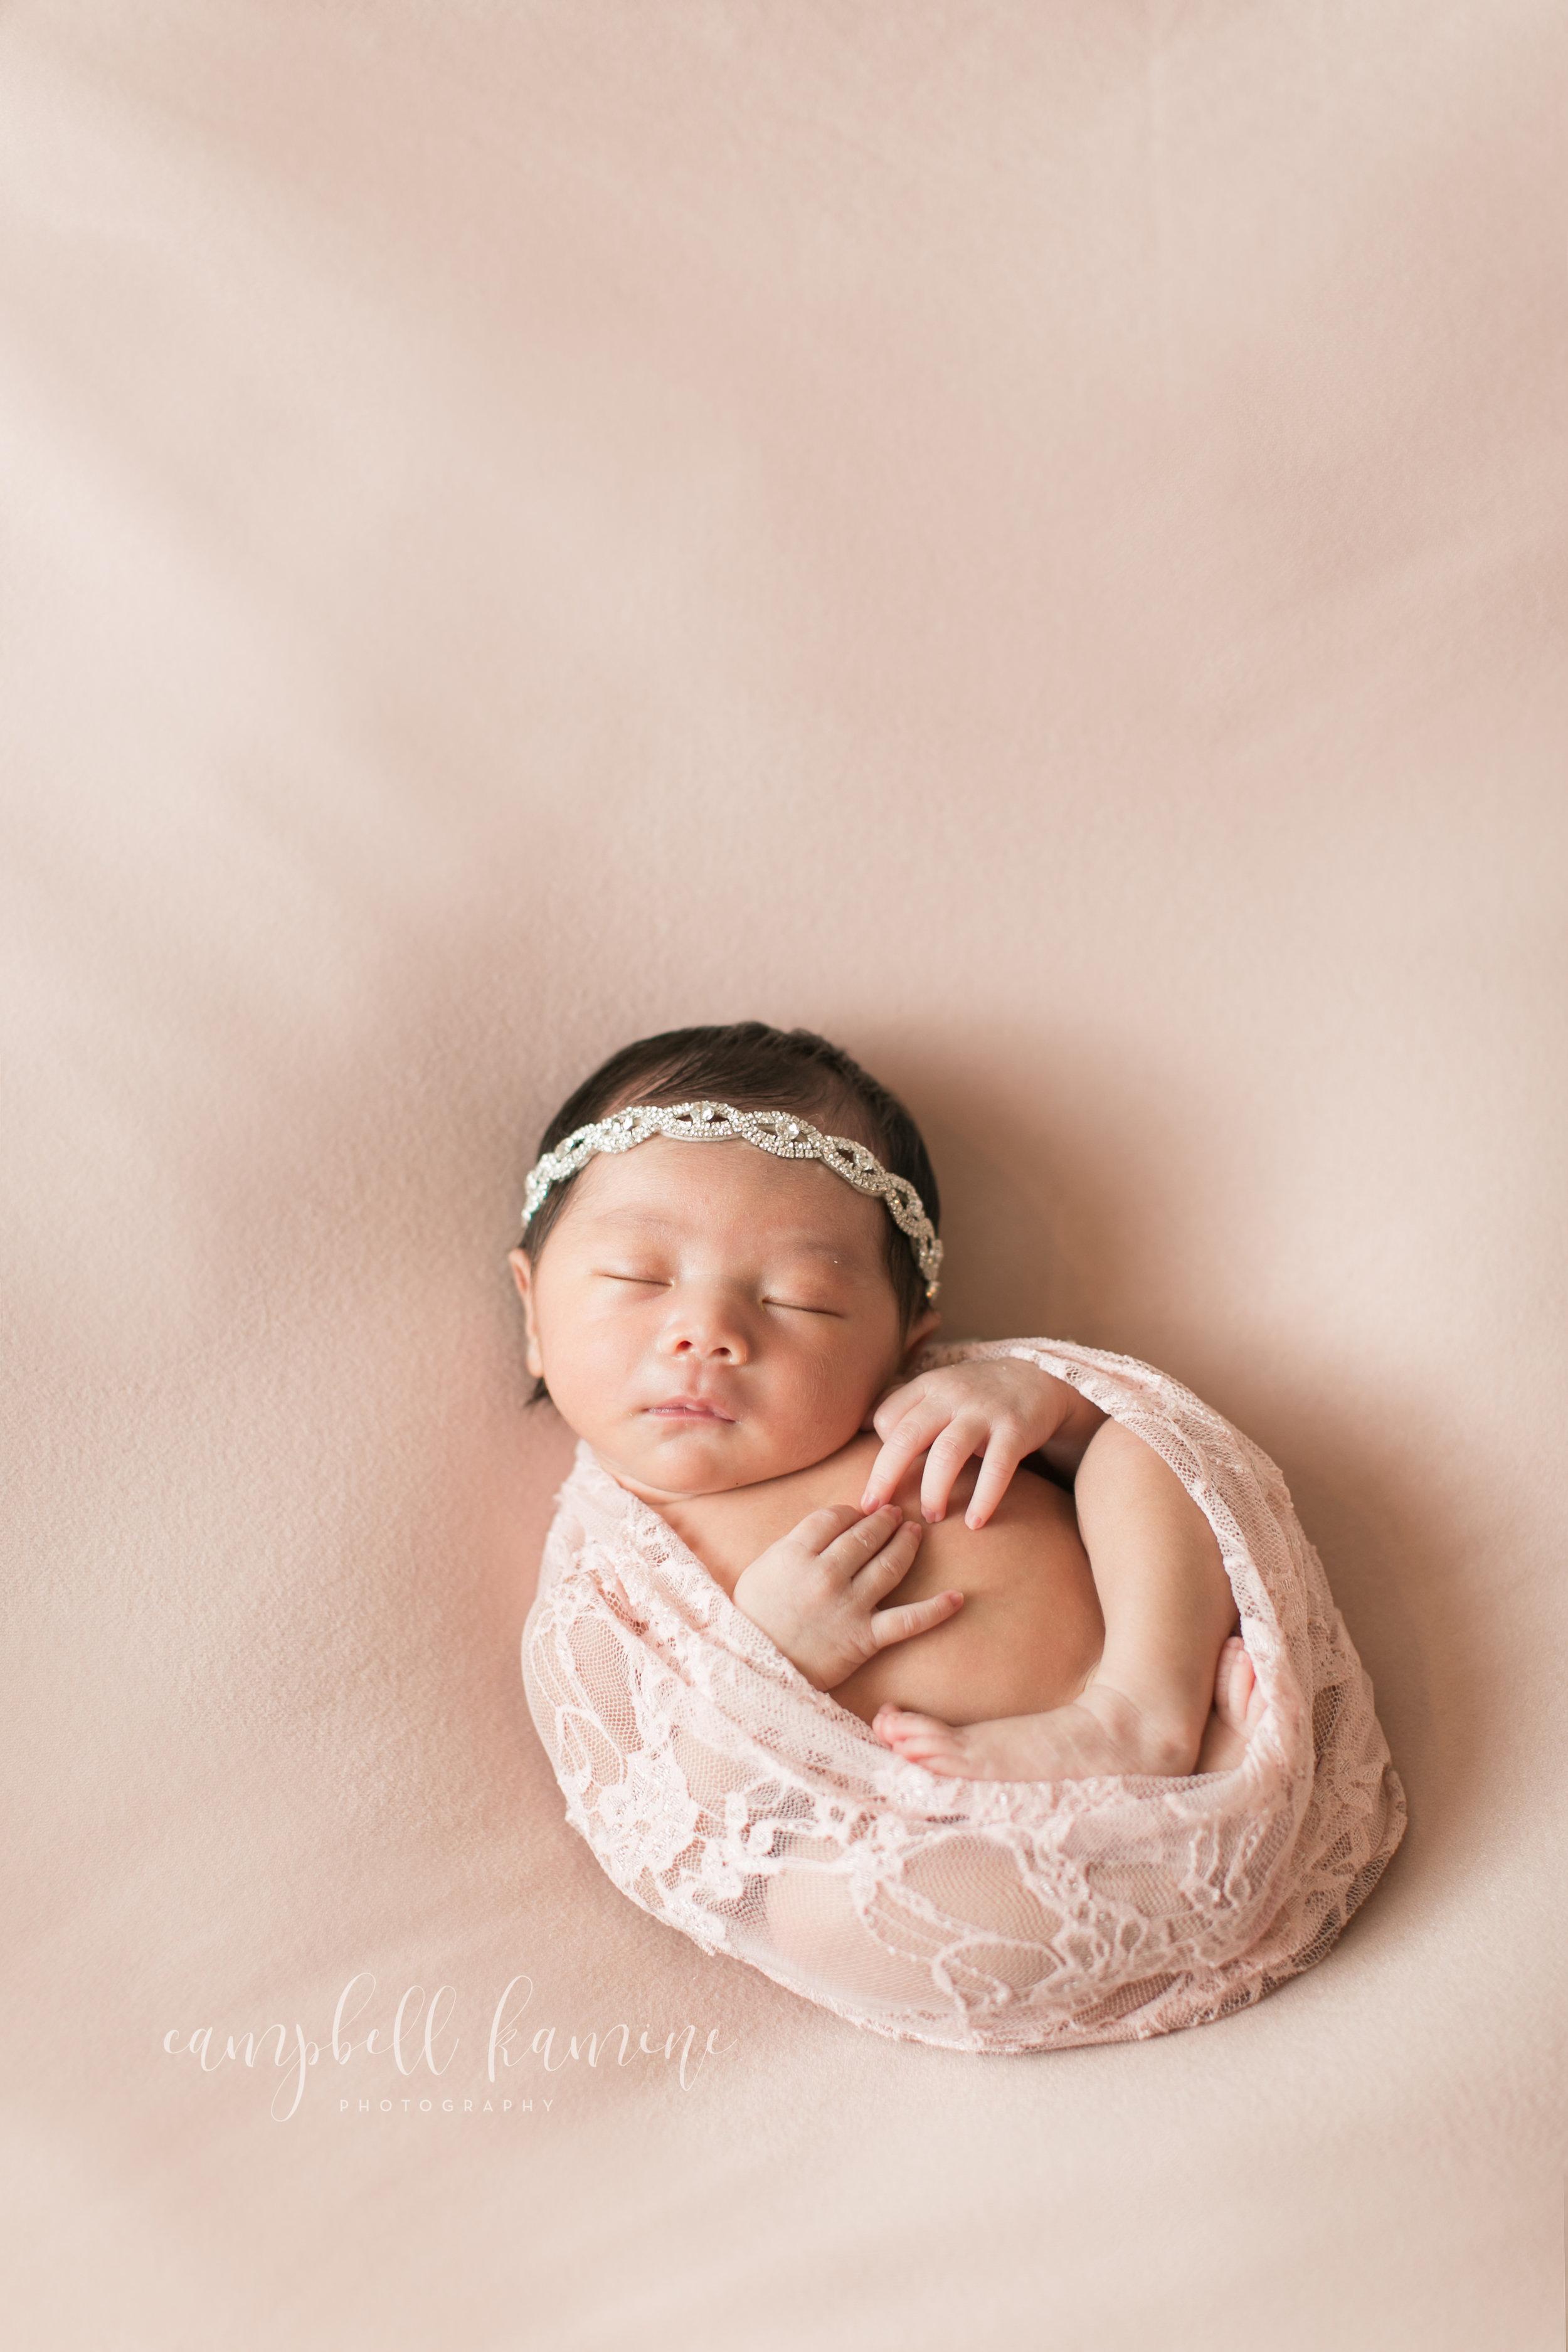 Newborn Photography | Lily | Campbell Kamine Photgraphy-1.jpg